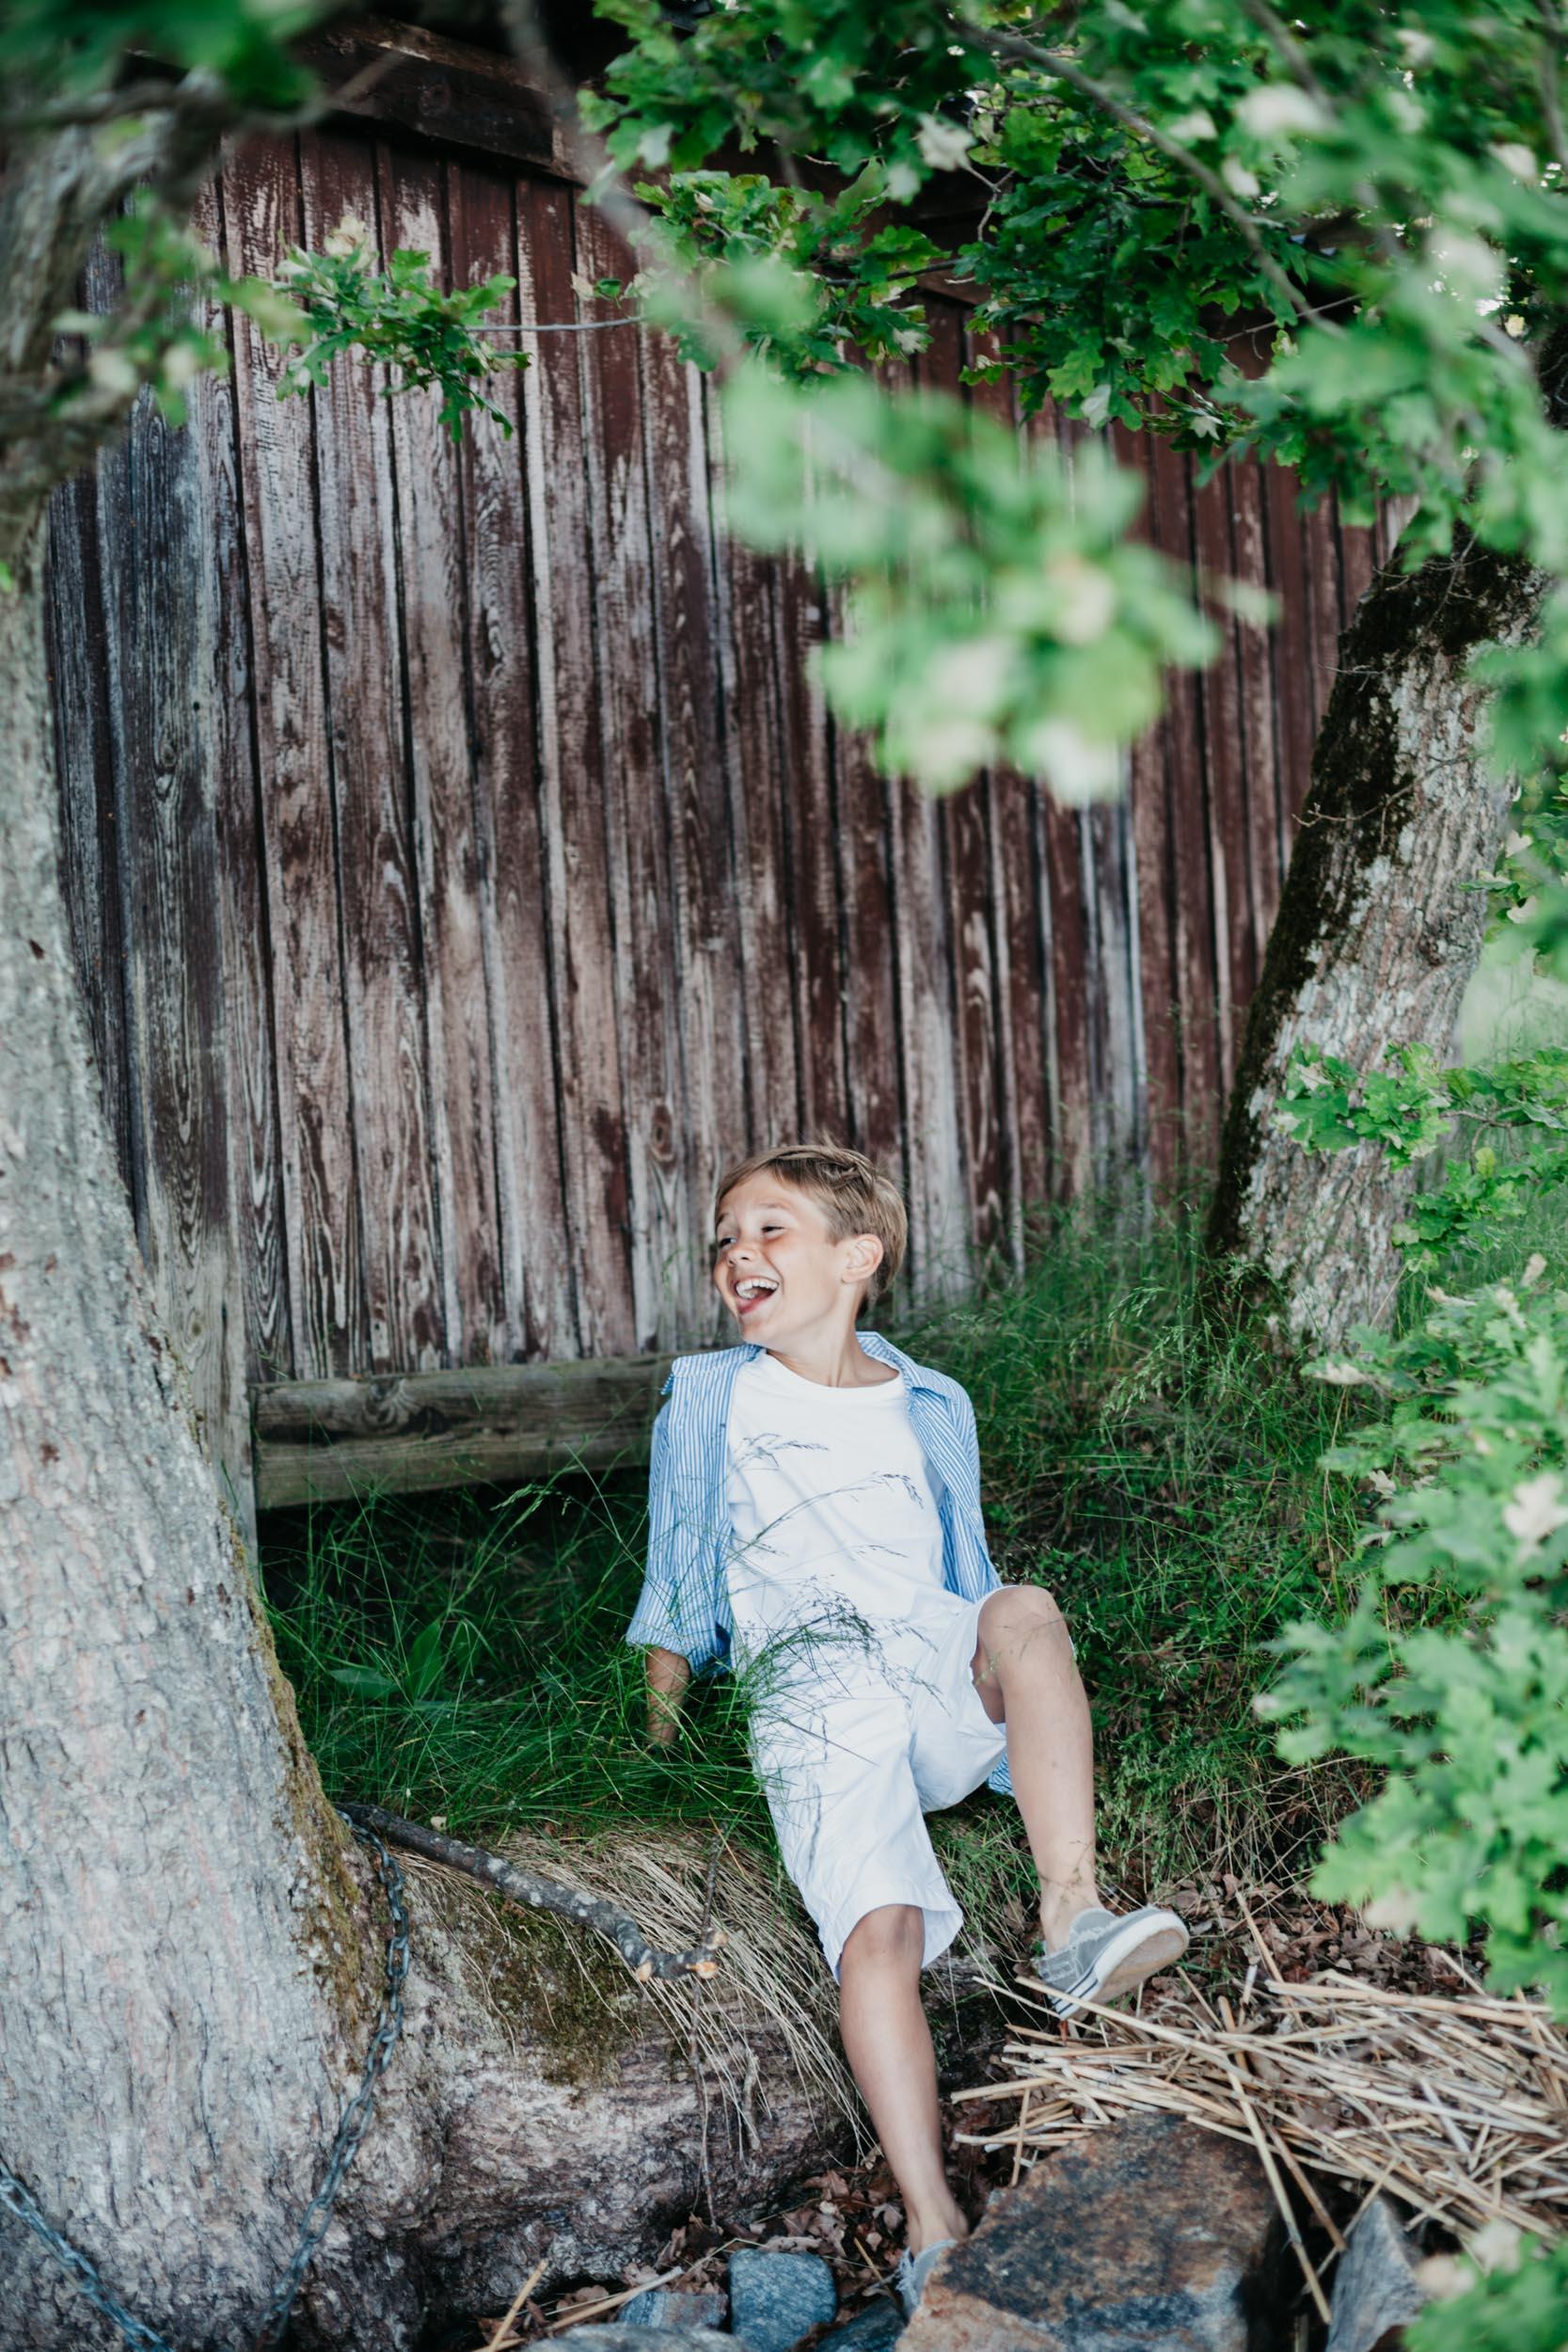 barnfotograf-stockholm-odd brown bird-1.jpg